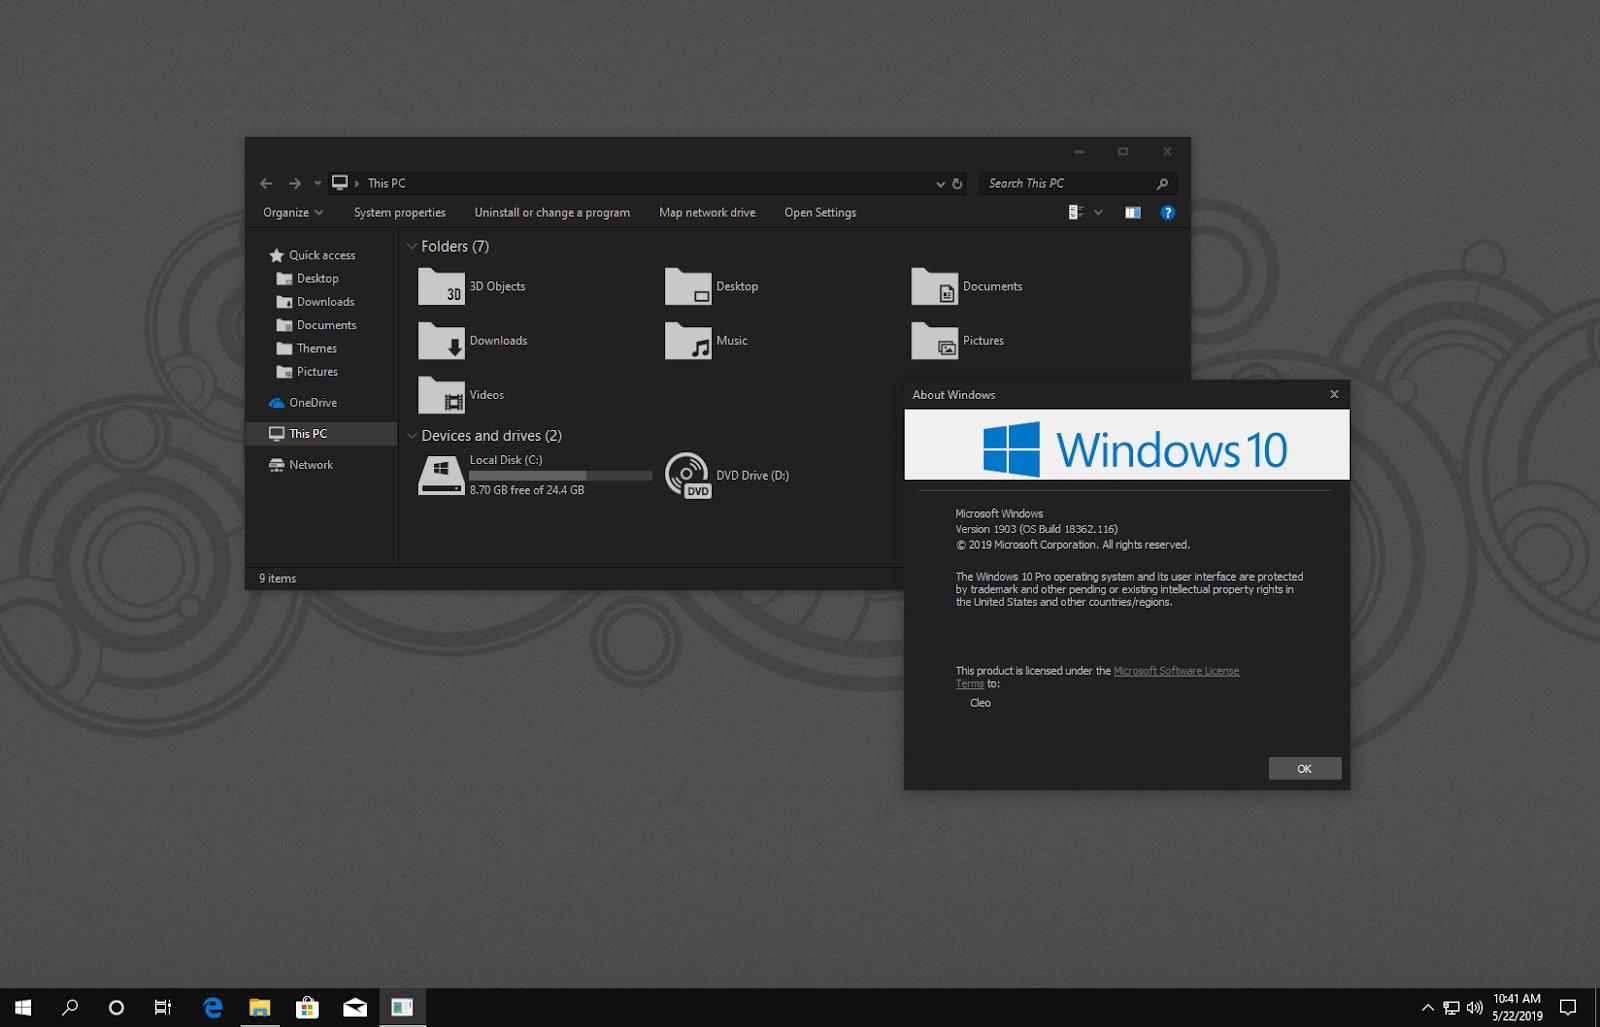 UxThemePatcher For Windows10 May 2019 Update 1903